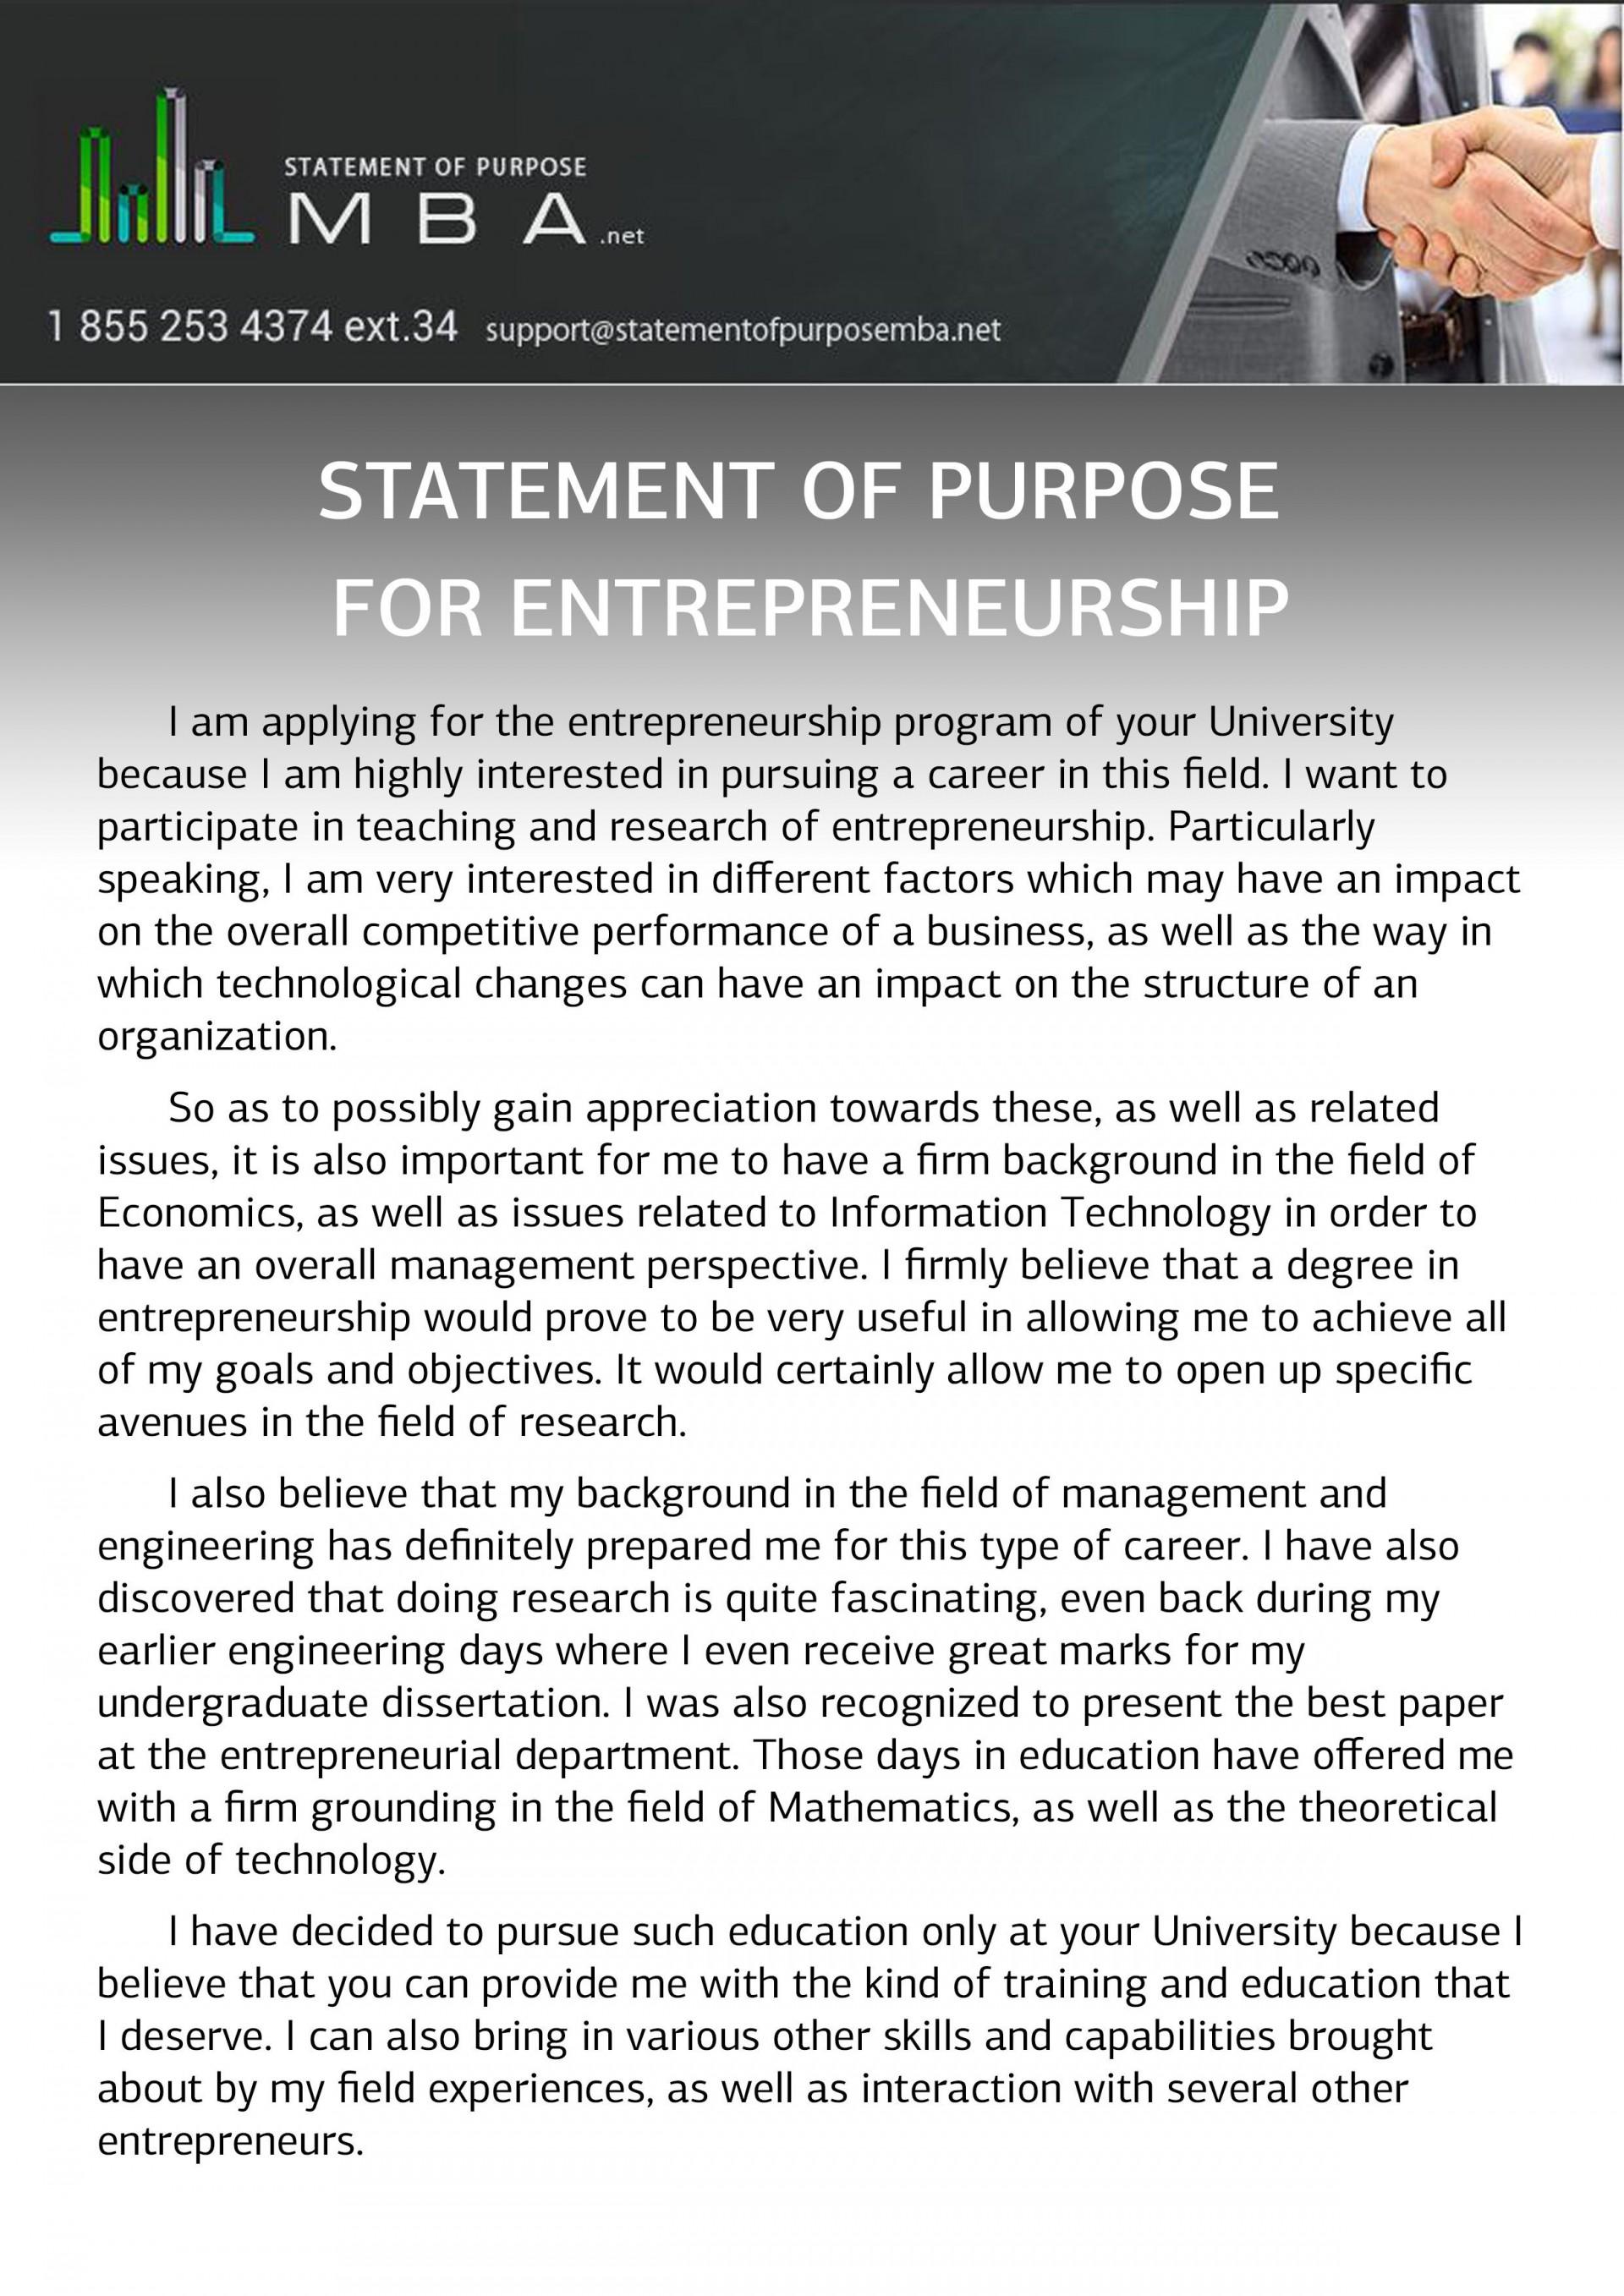 007 Essay Example Statement Of Purpose Sample Fearsome Essays Nursing Graduate School Education Mba 1920